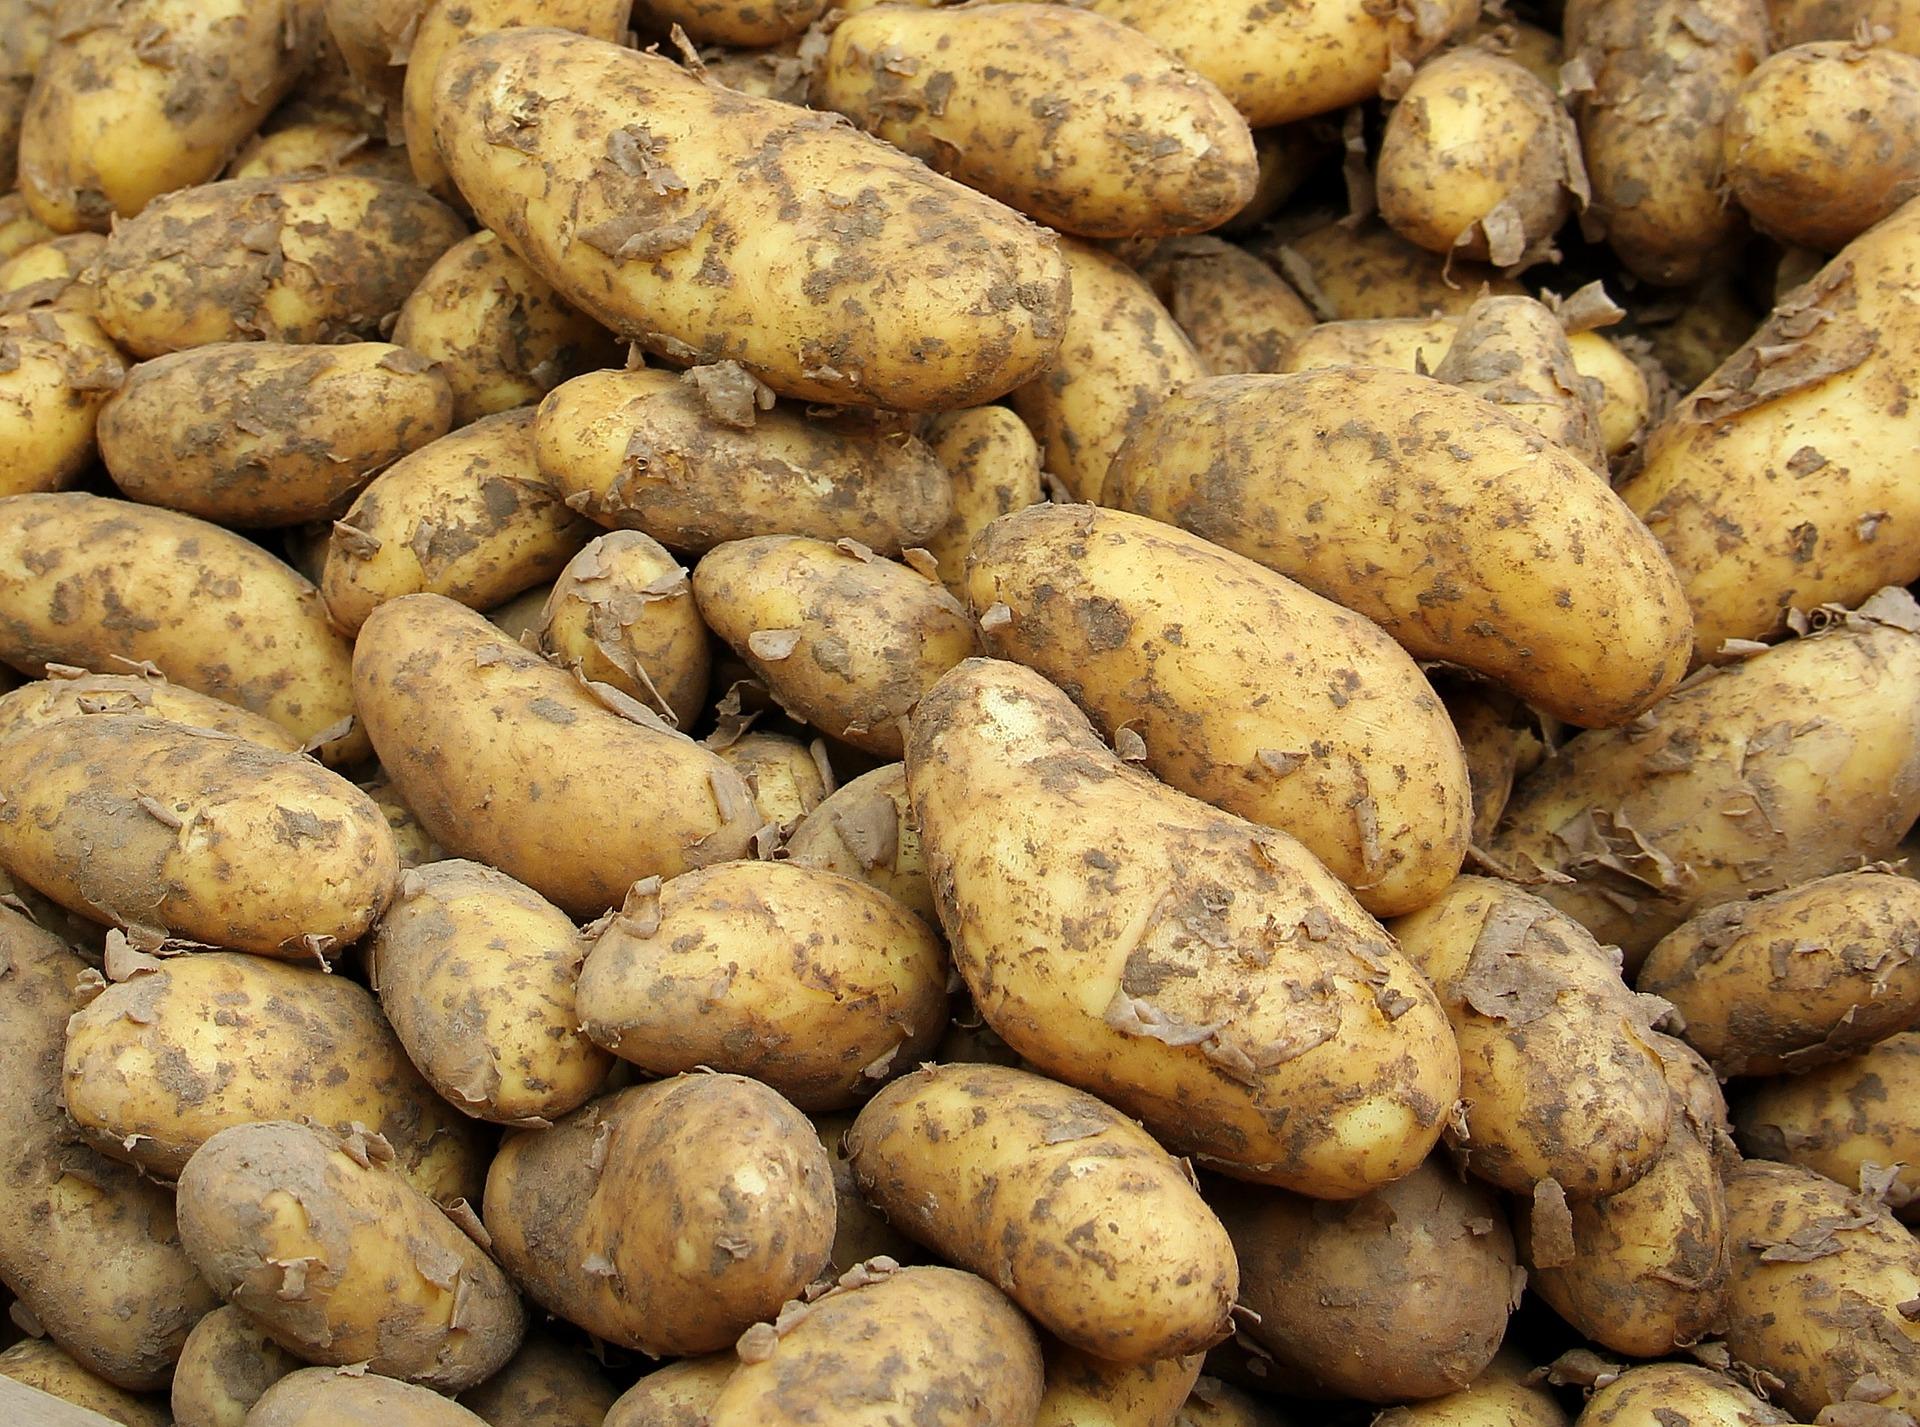 https://www.bioland.de/fileadmin/user_upload/Verbraucher/Blog/So_geht_Bio_/Kartoffel/Kartoffeln_Header_Ranking.jpg